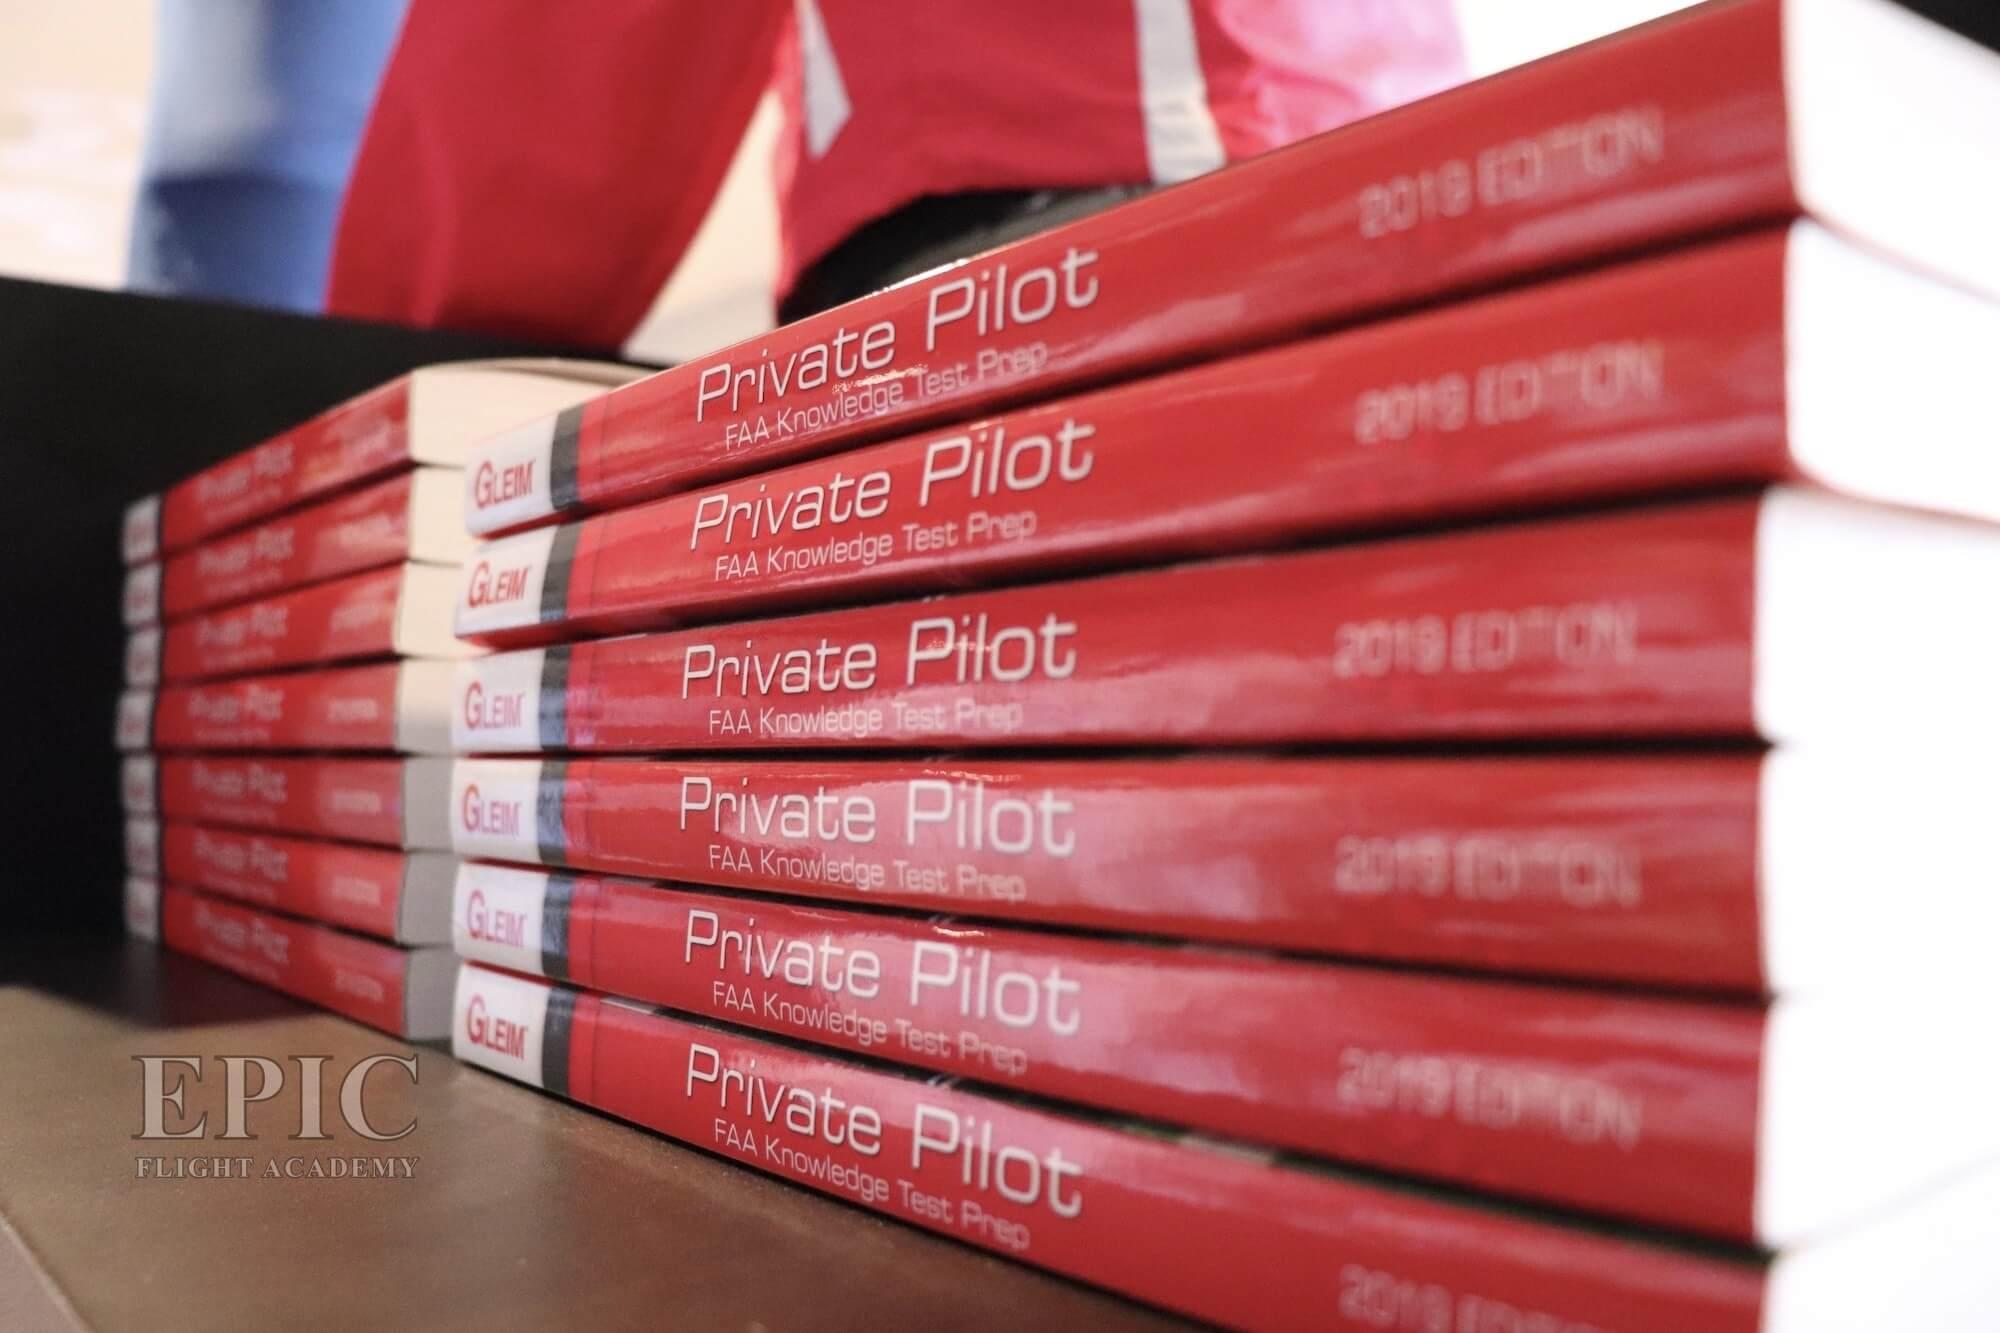 Private Pilot Course Materials